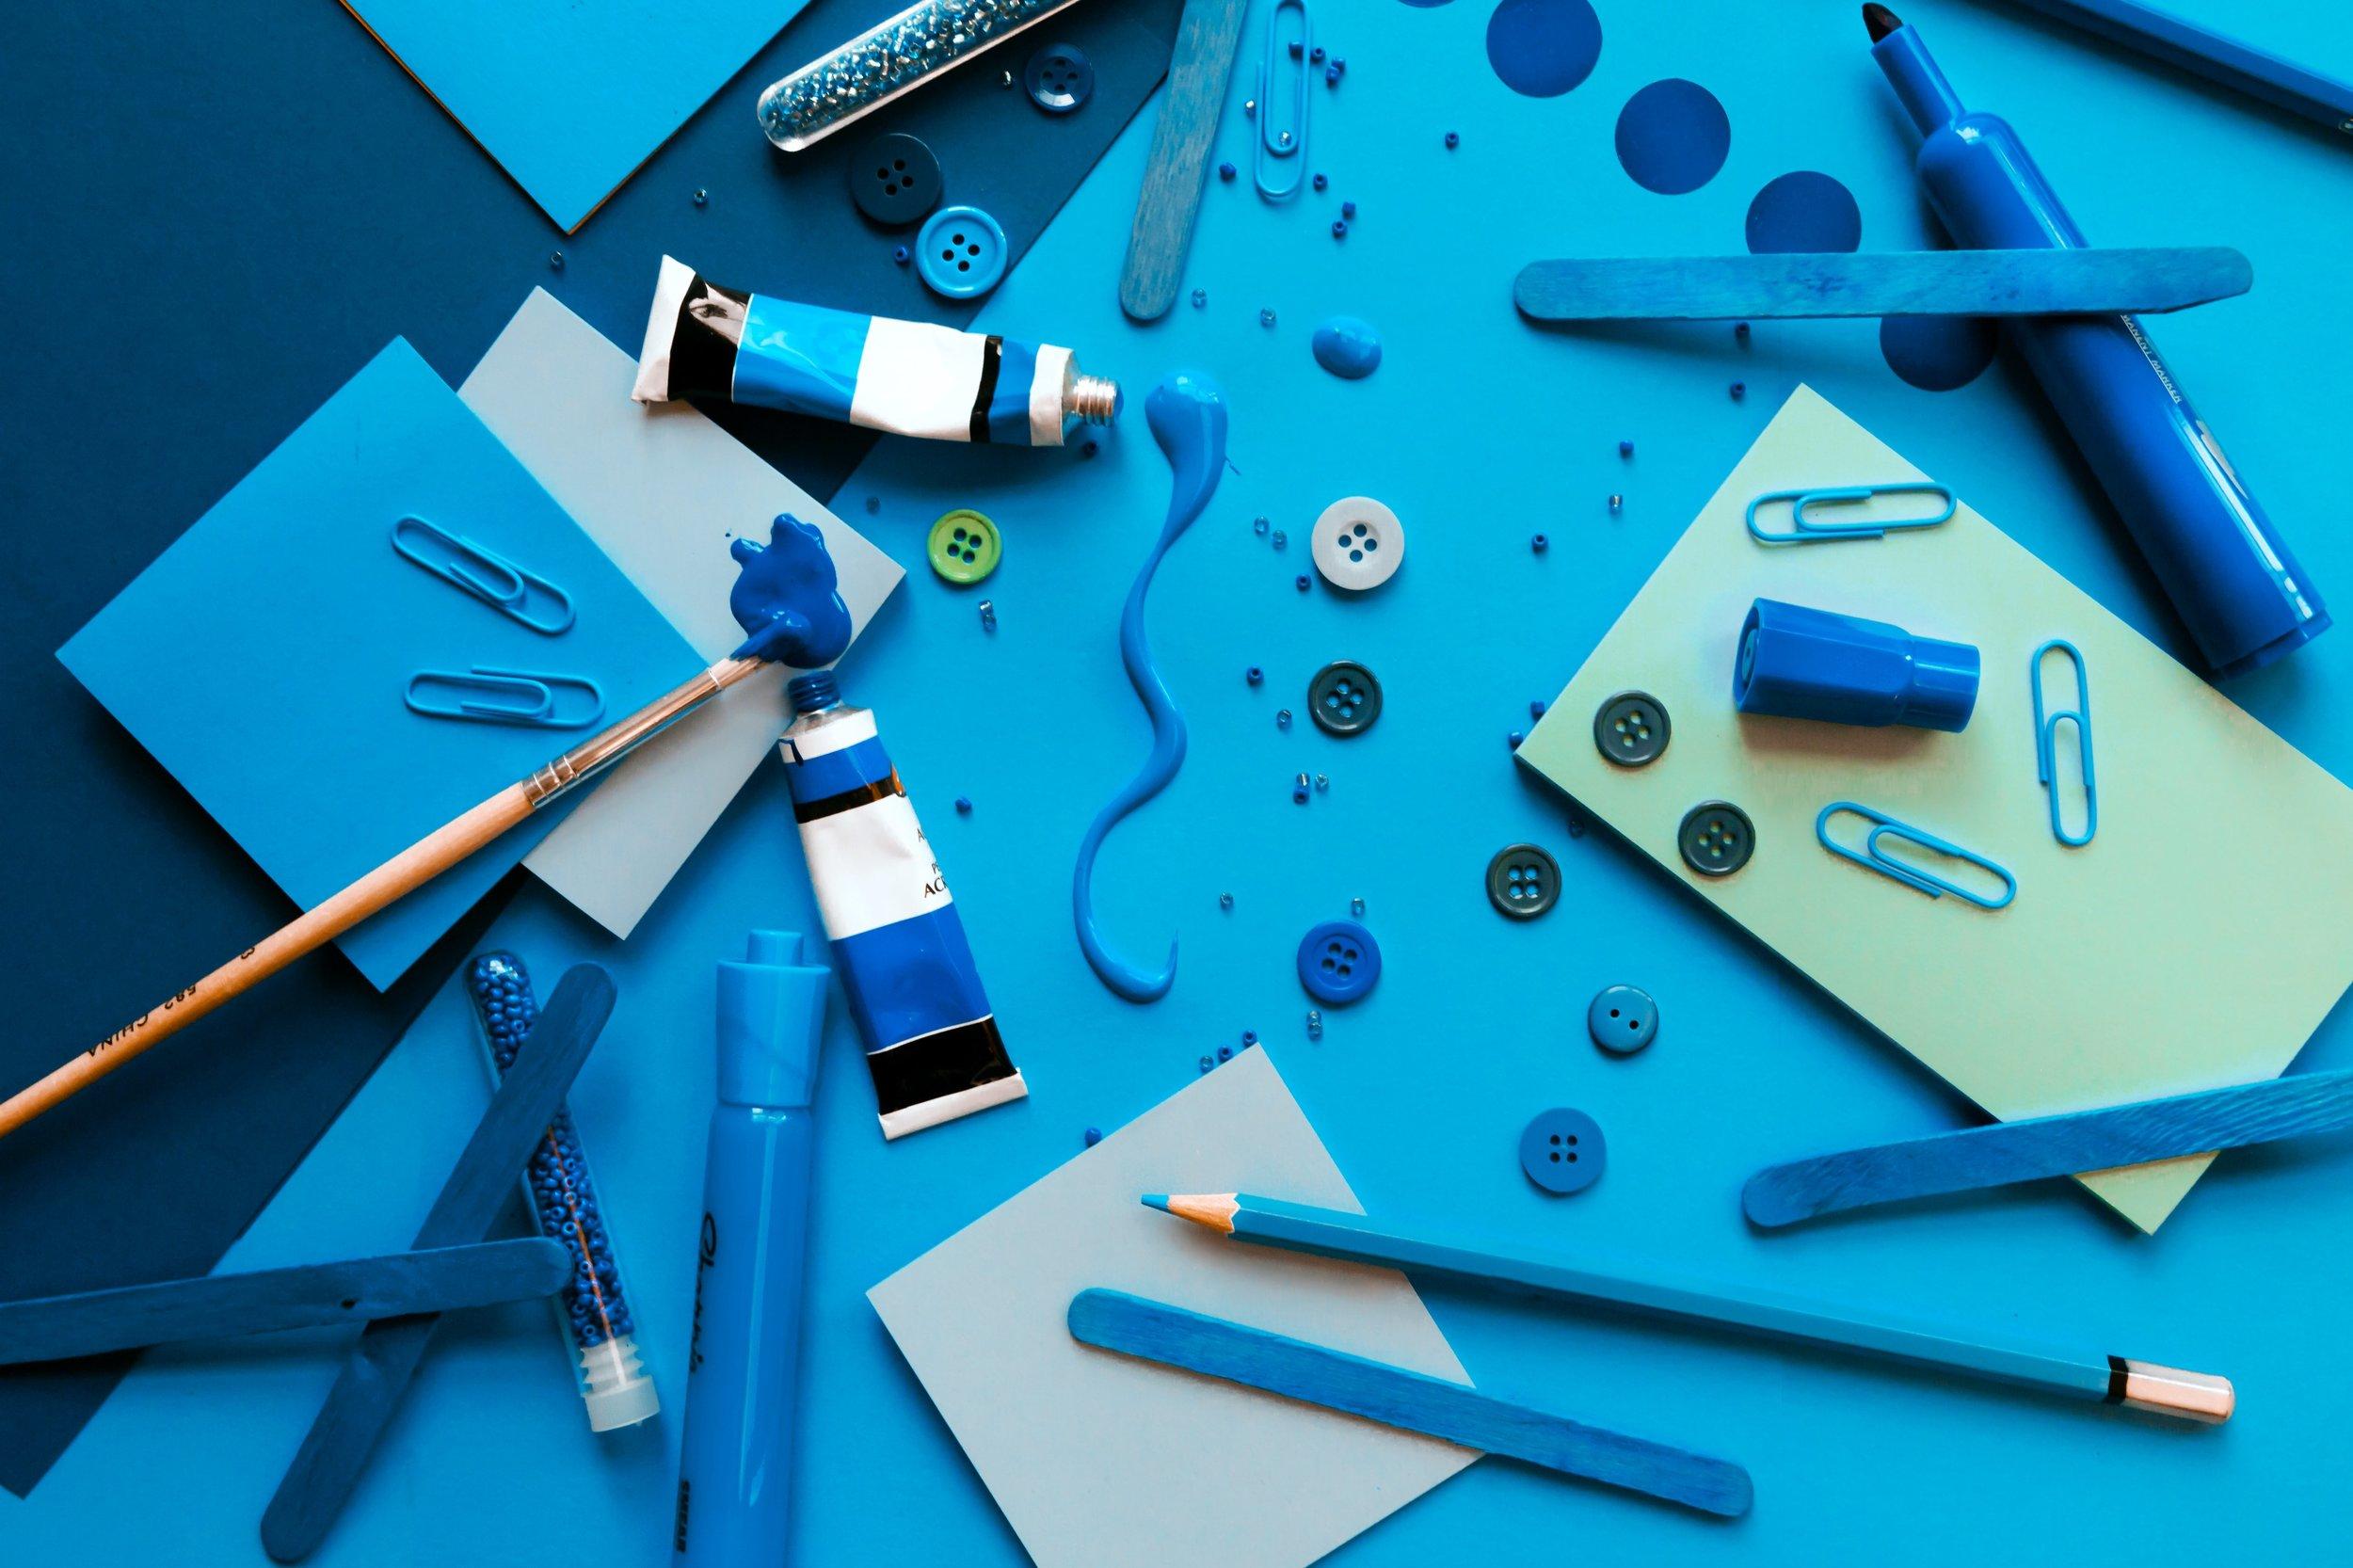 arts-crafts-in-blue.jpg